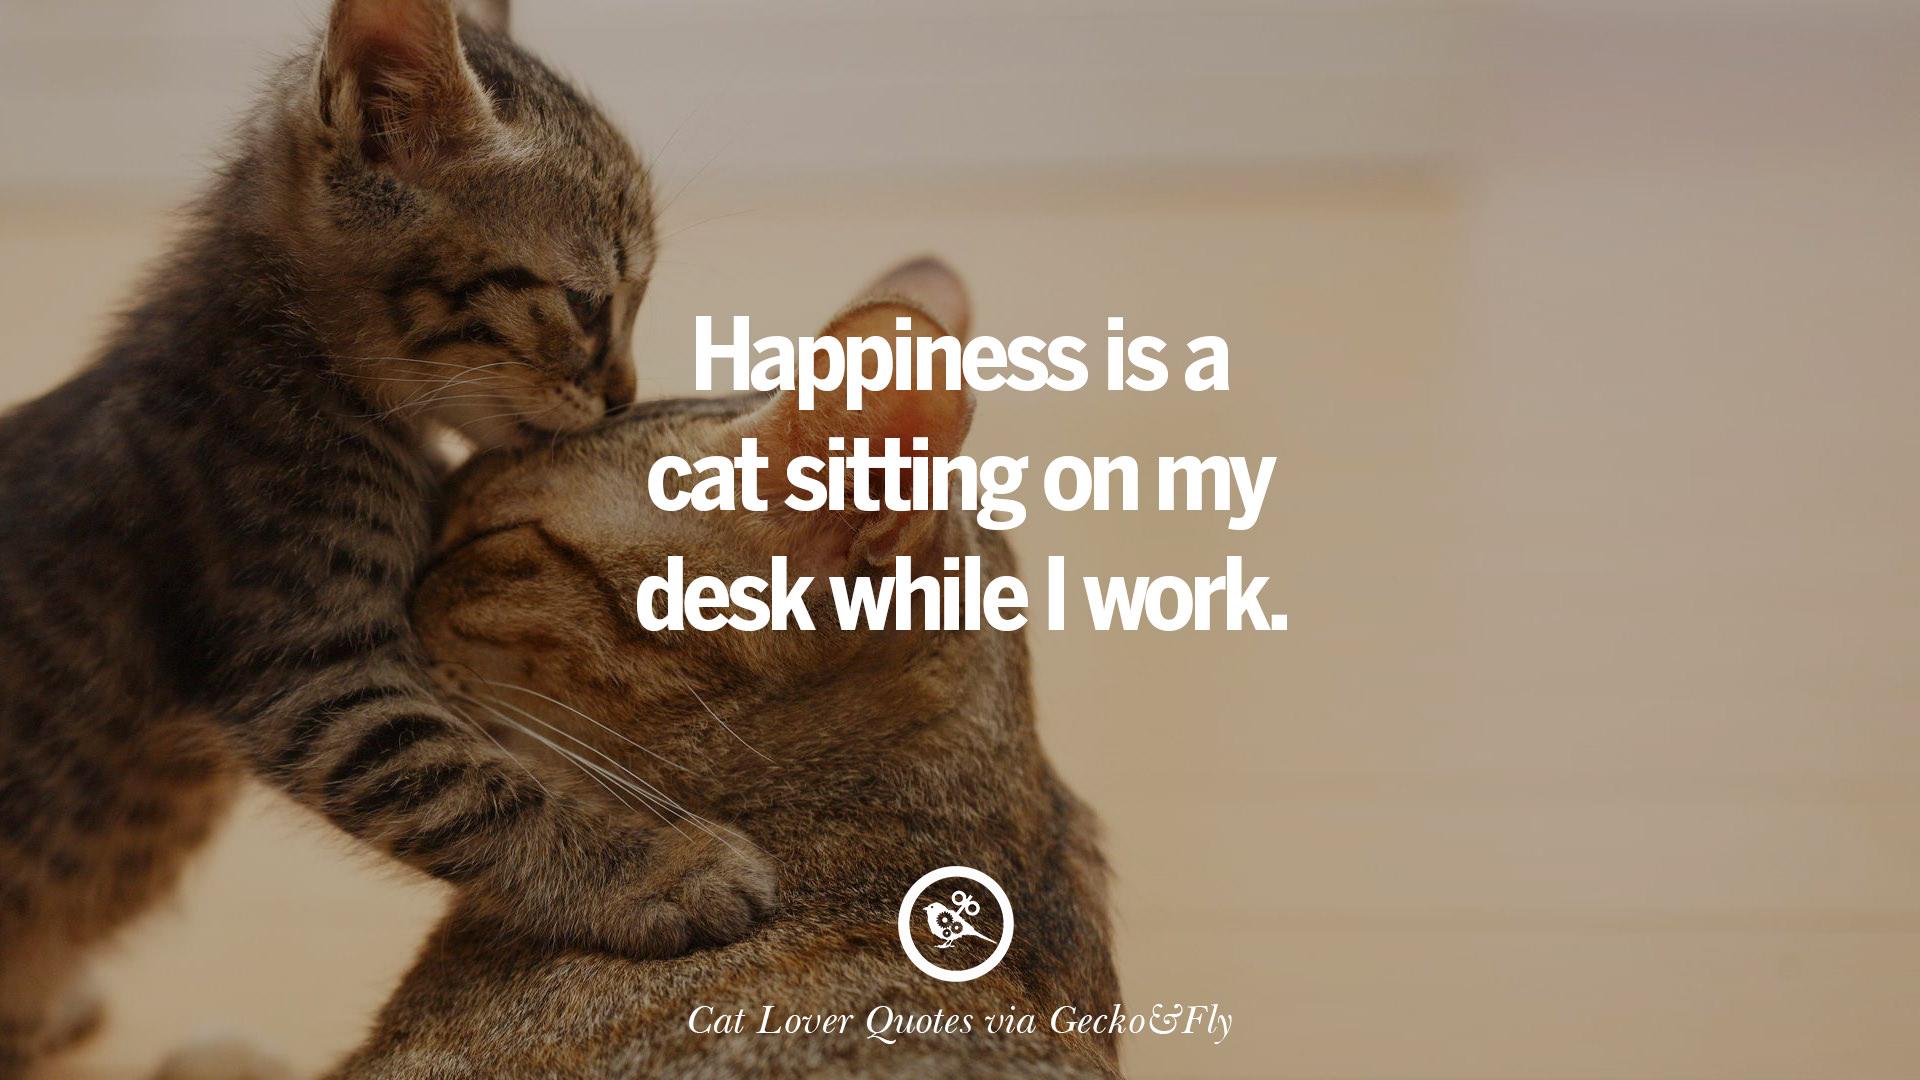 Cat Quotes | 25 Cute Cat Images With Quotes For Crazy Cat Ladies Gentlemen And